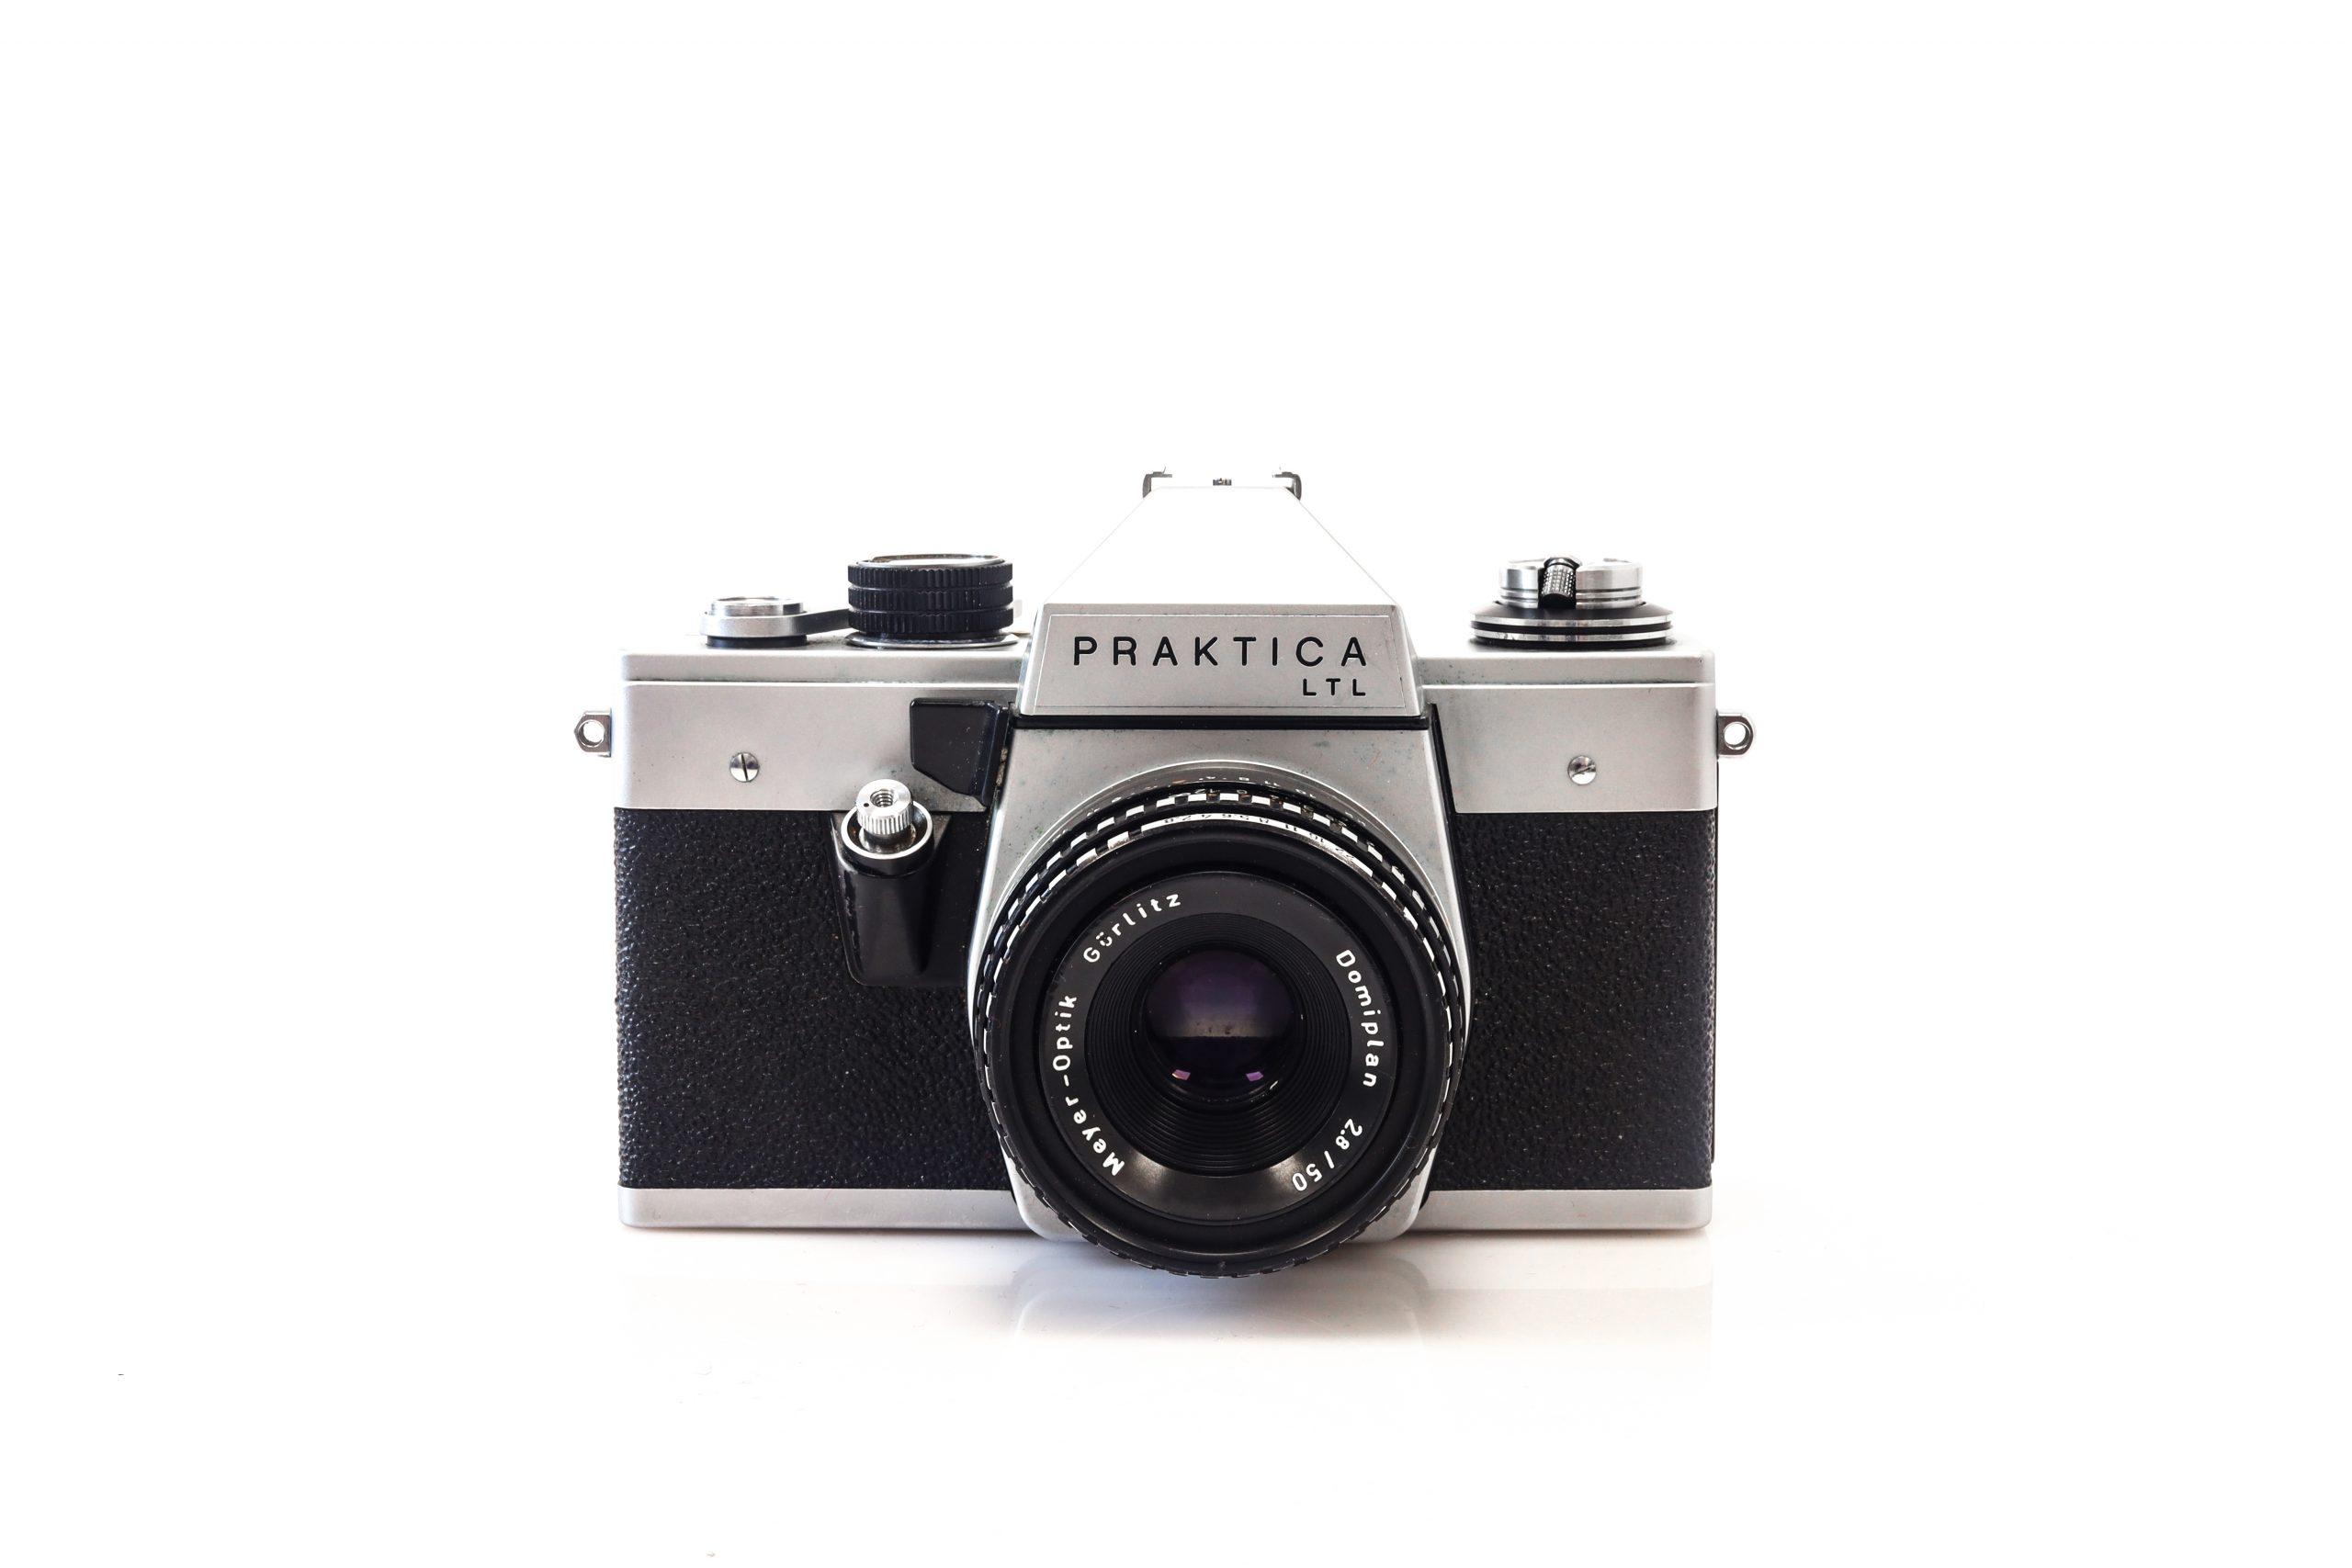 Beautiful Praktica LTL 35mm Film Camera with Meyer Optiks 50mm F2.8 Lens